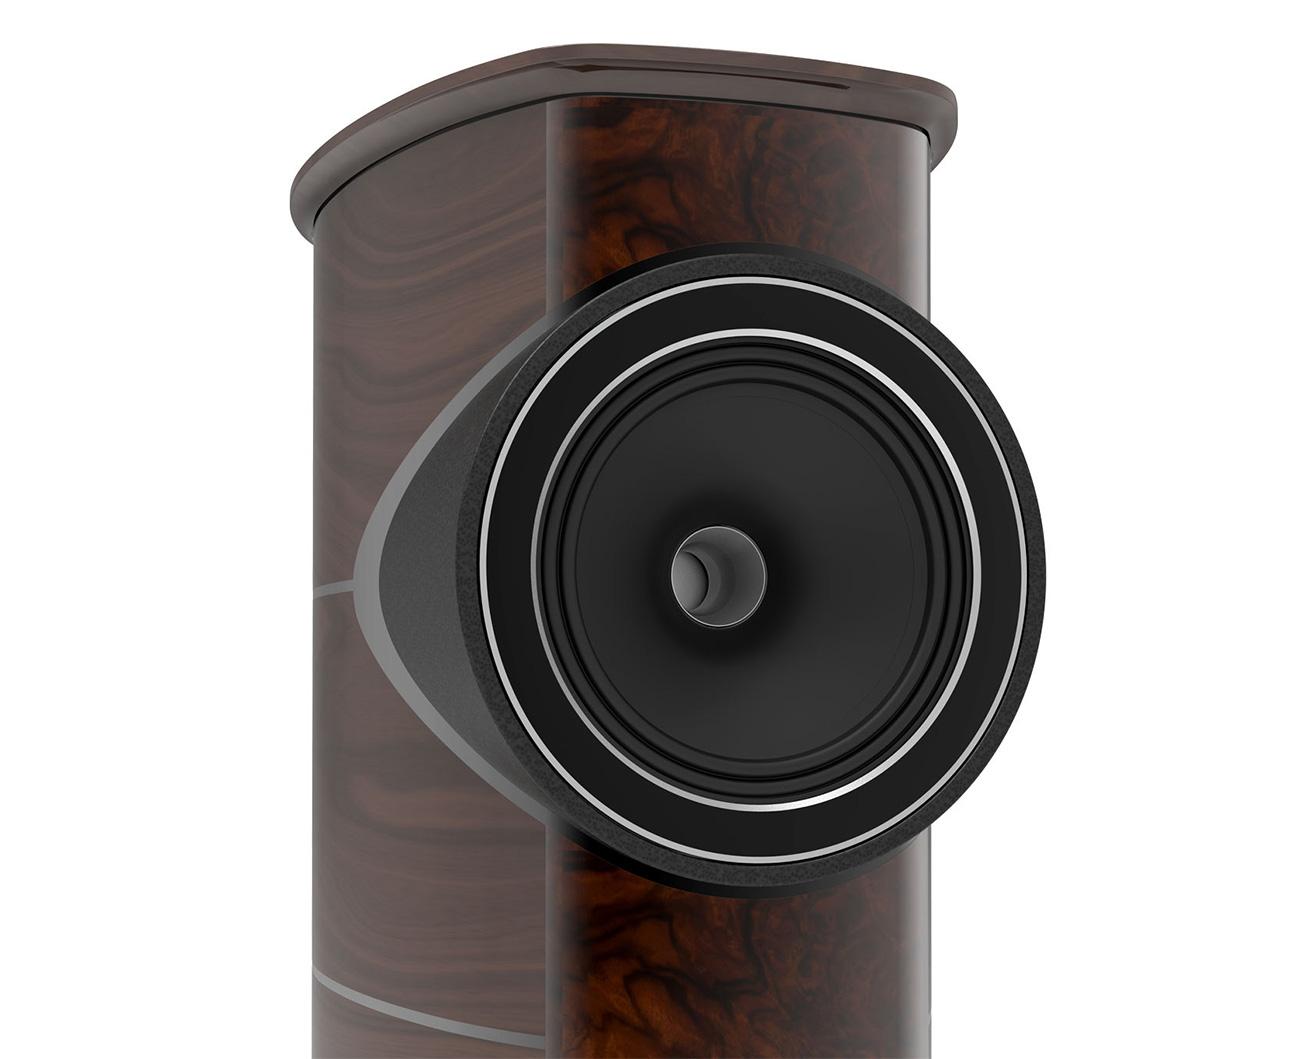 Fyne Audio F1 12 detalj zvučnika